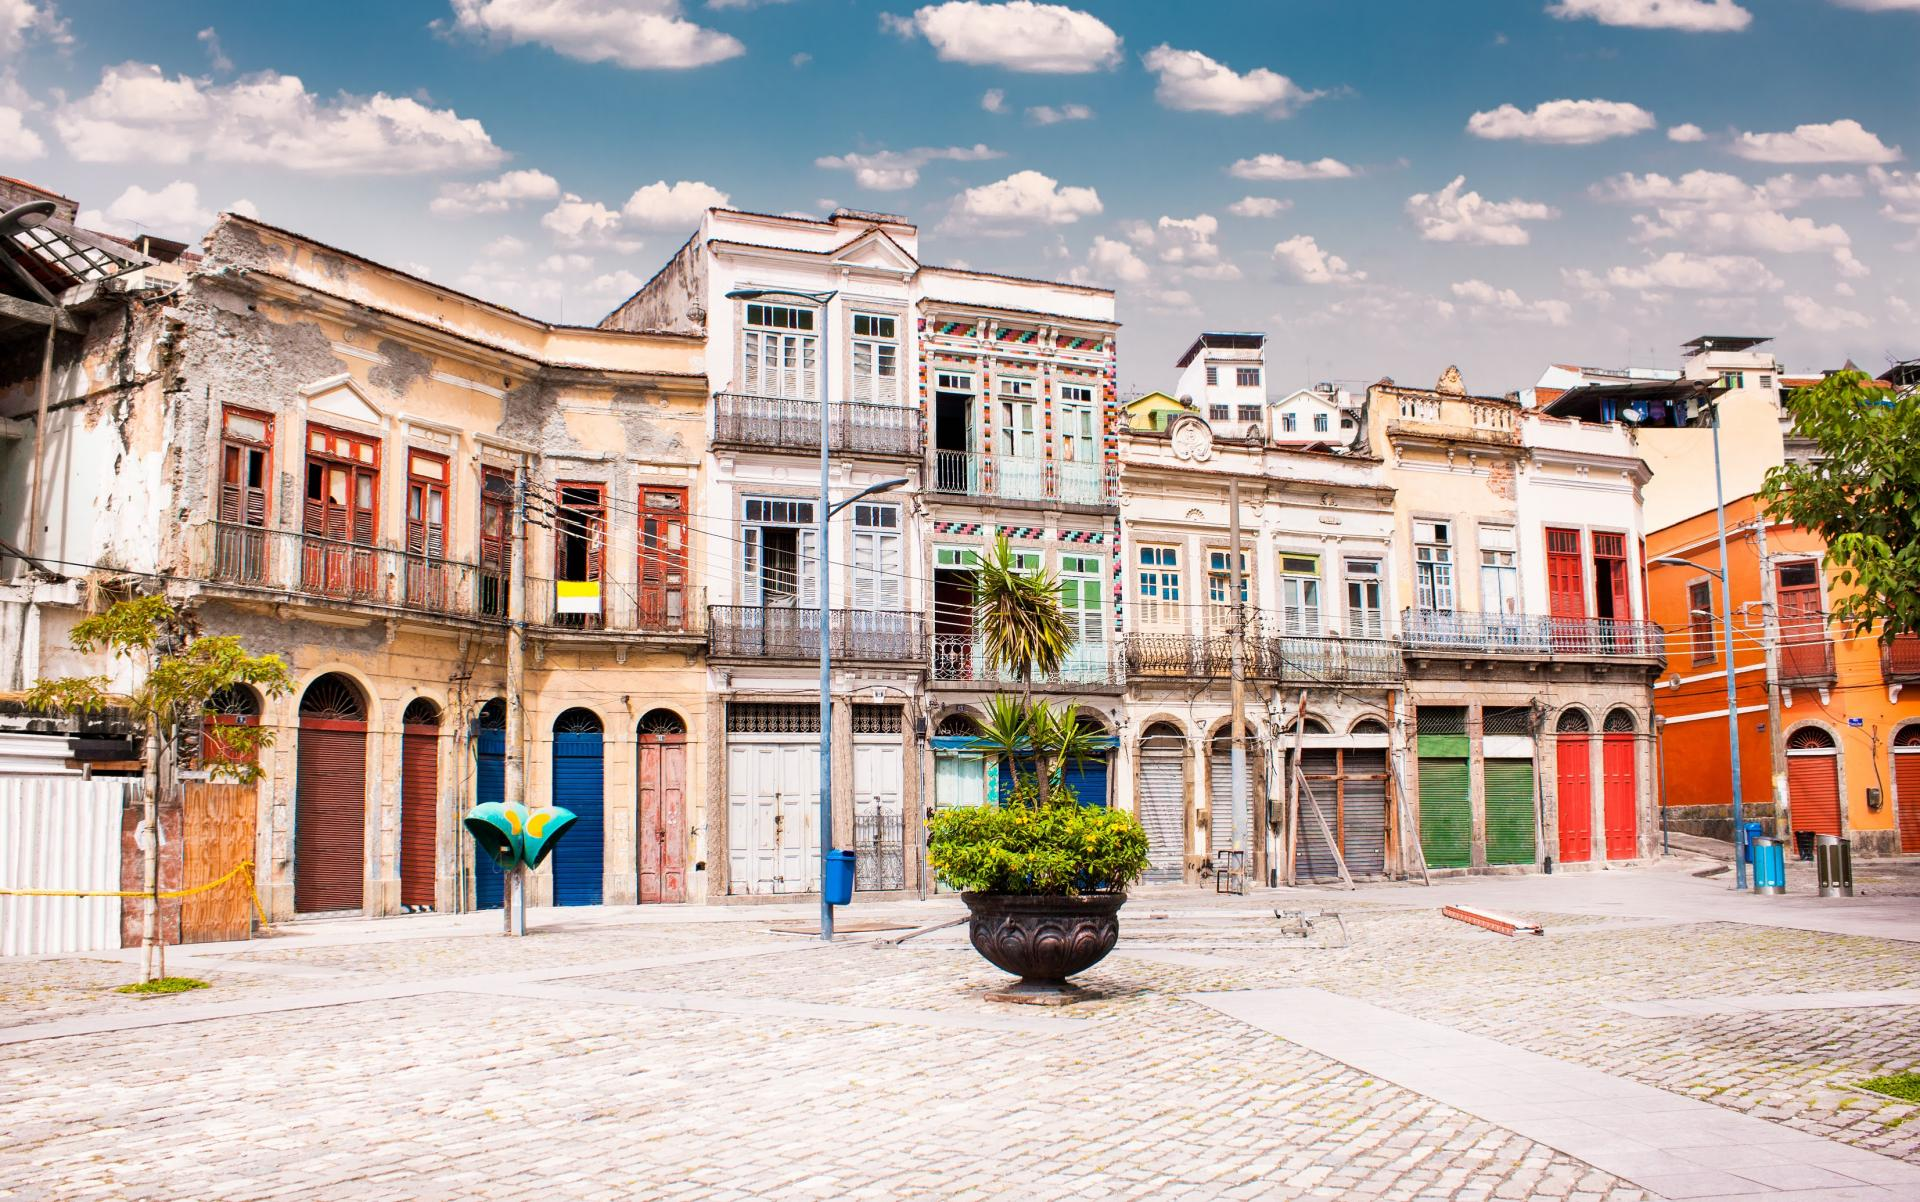 Tagestour Walkingtour Rio de Janeiro & Zuckerhut (7h, privat): Alte Architektur